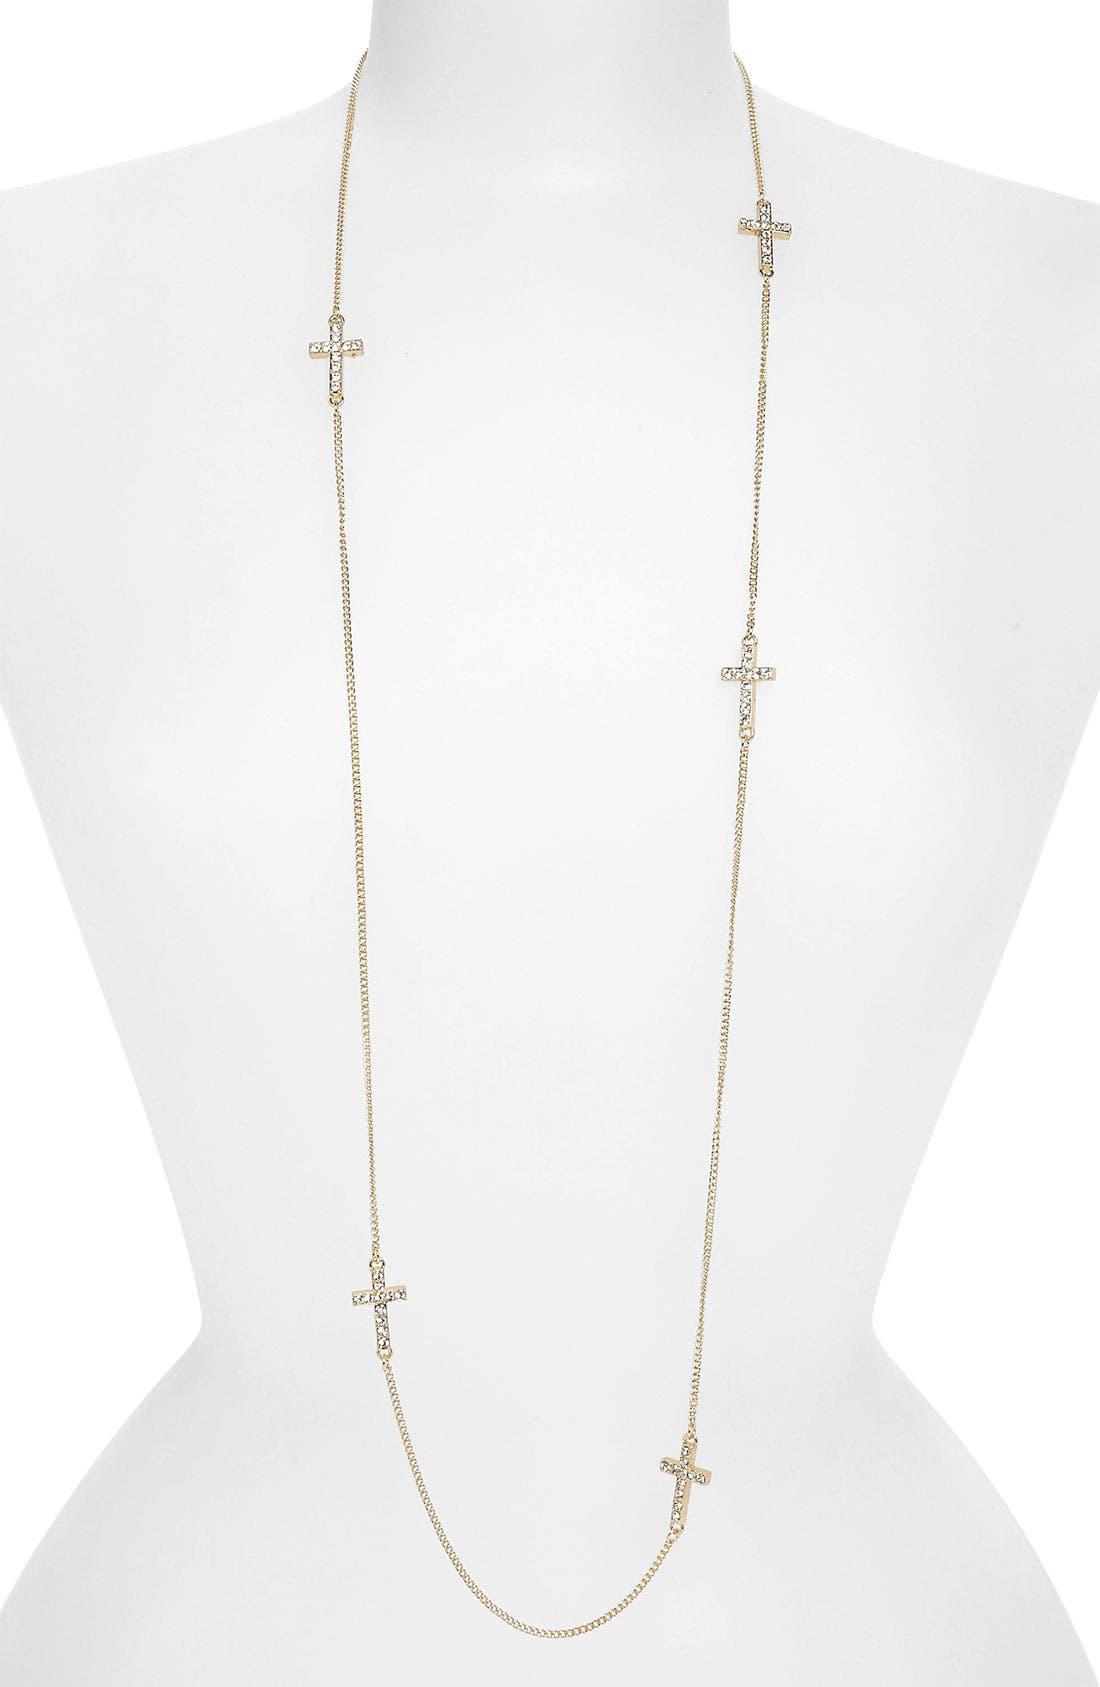 Alternate Image 1 Selected - BP. Rhinestone Cross Layering Necklace